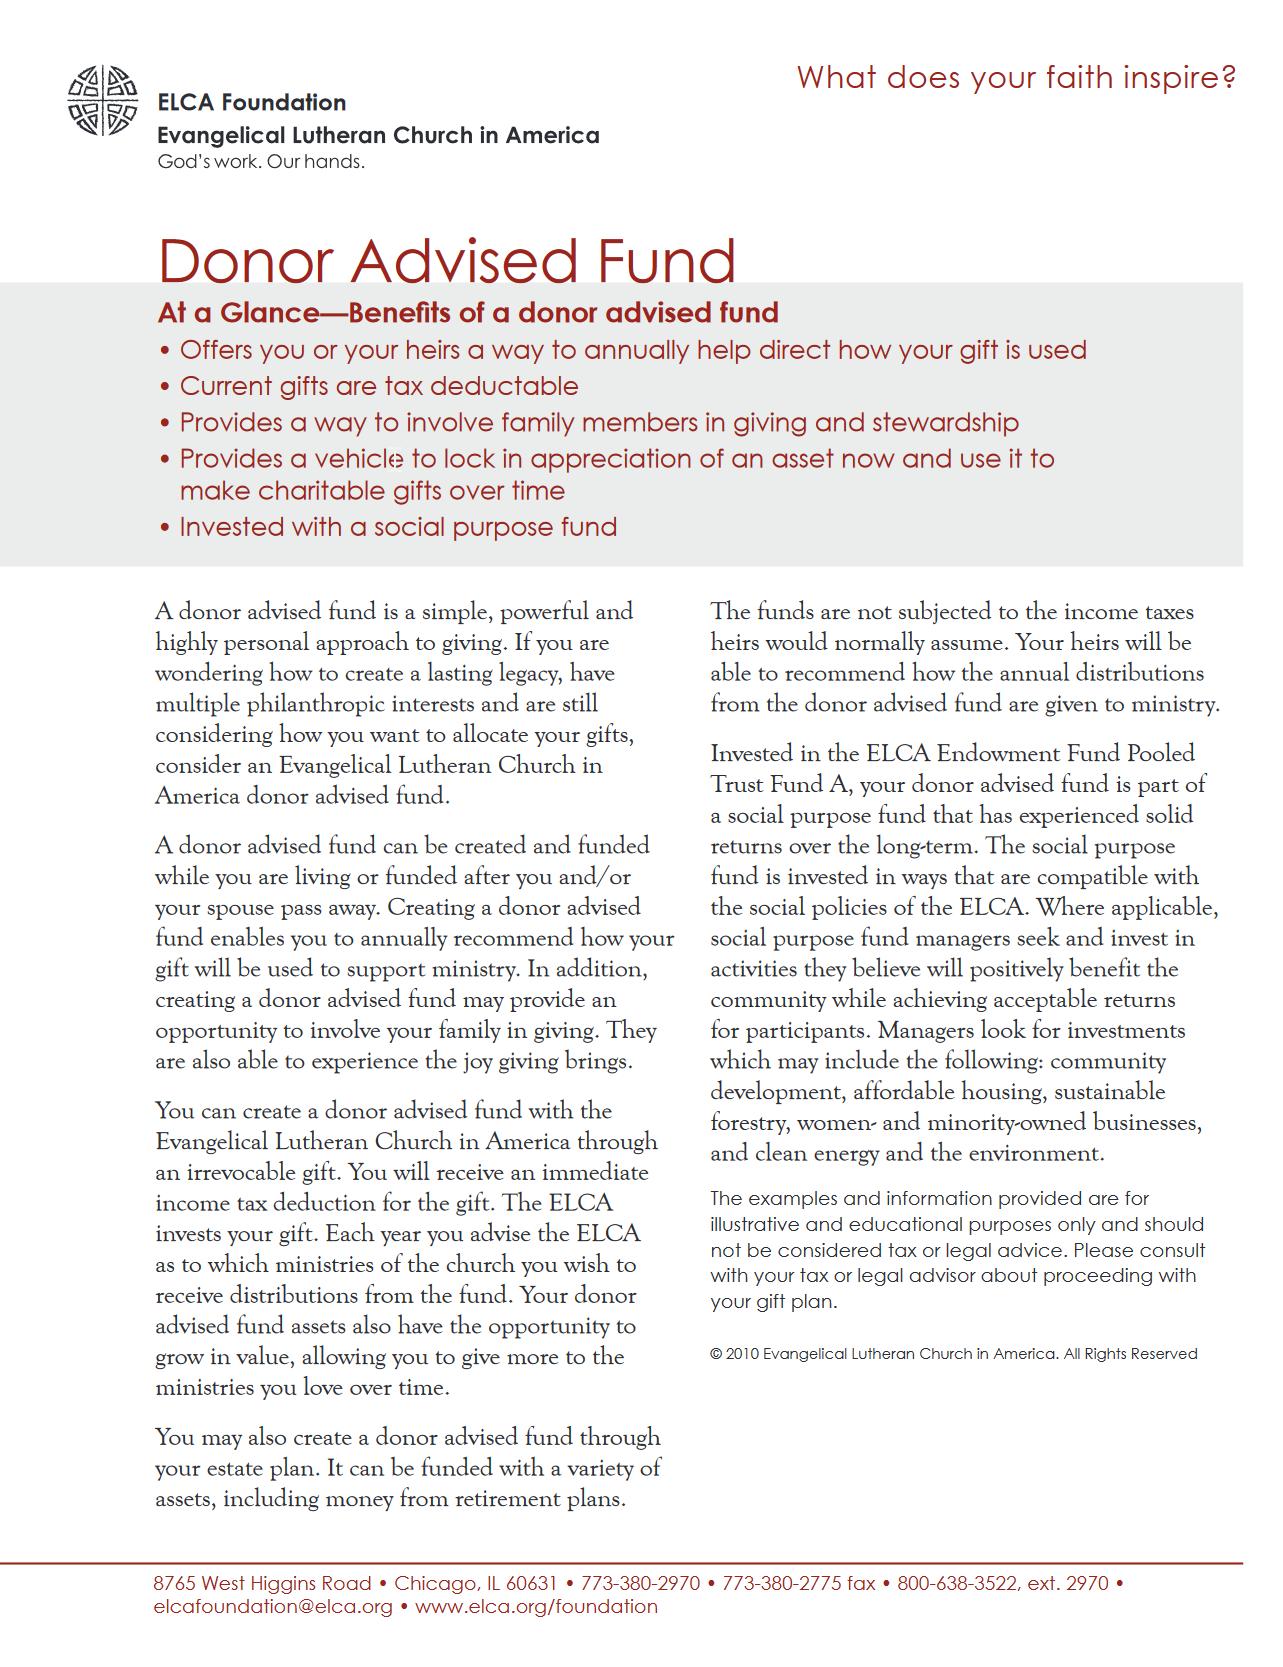 Donor_Advised_Fund